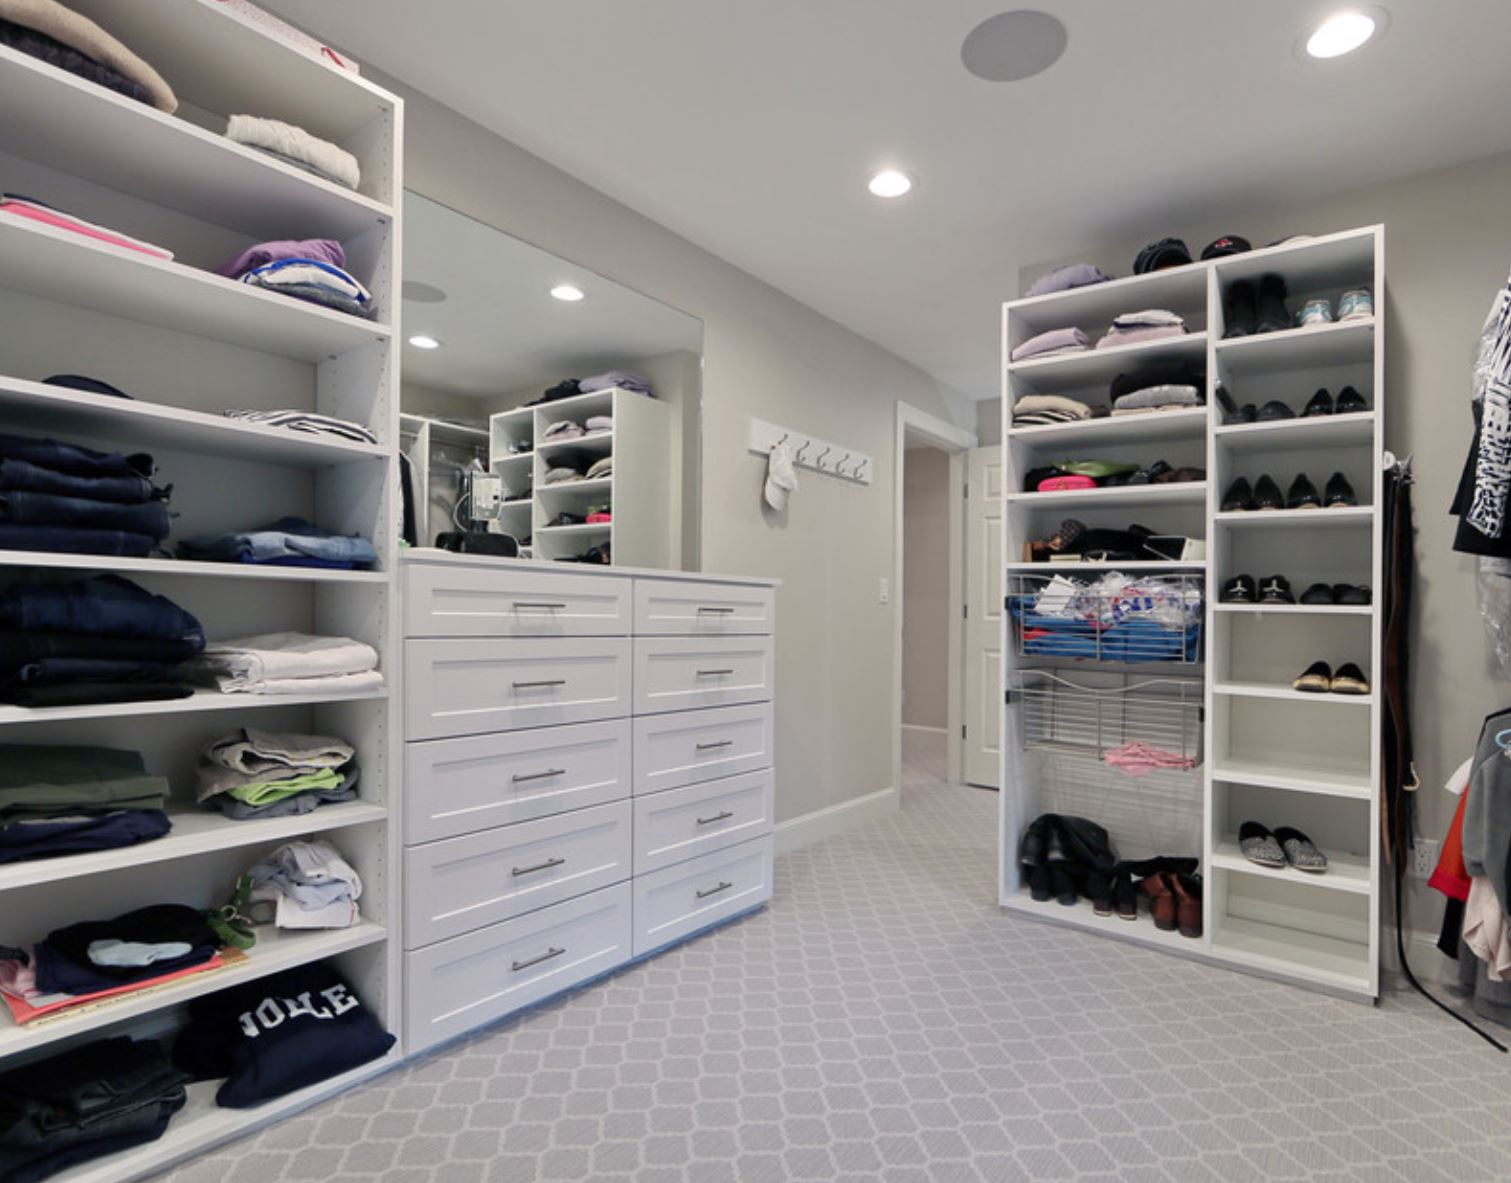 weston bedroom closet 2